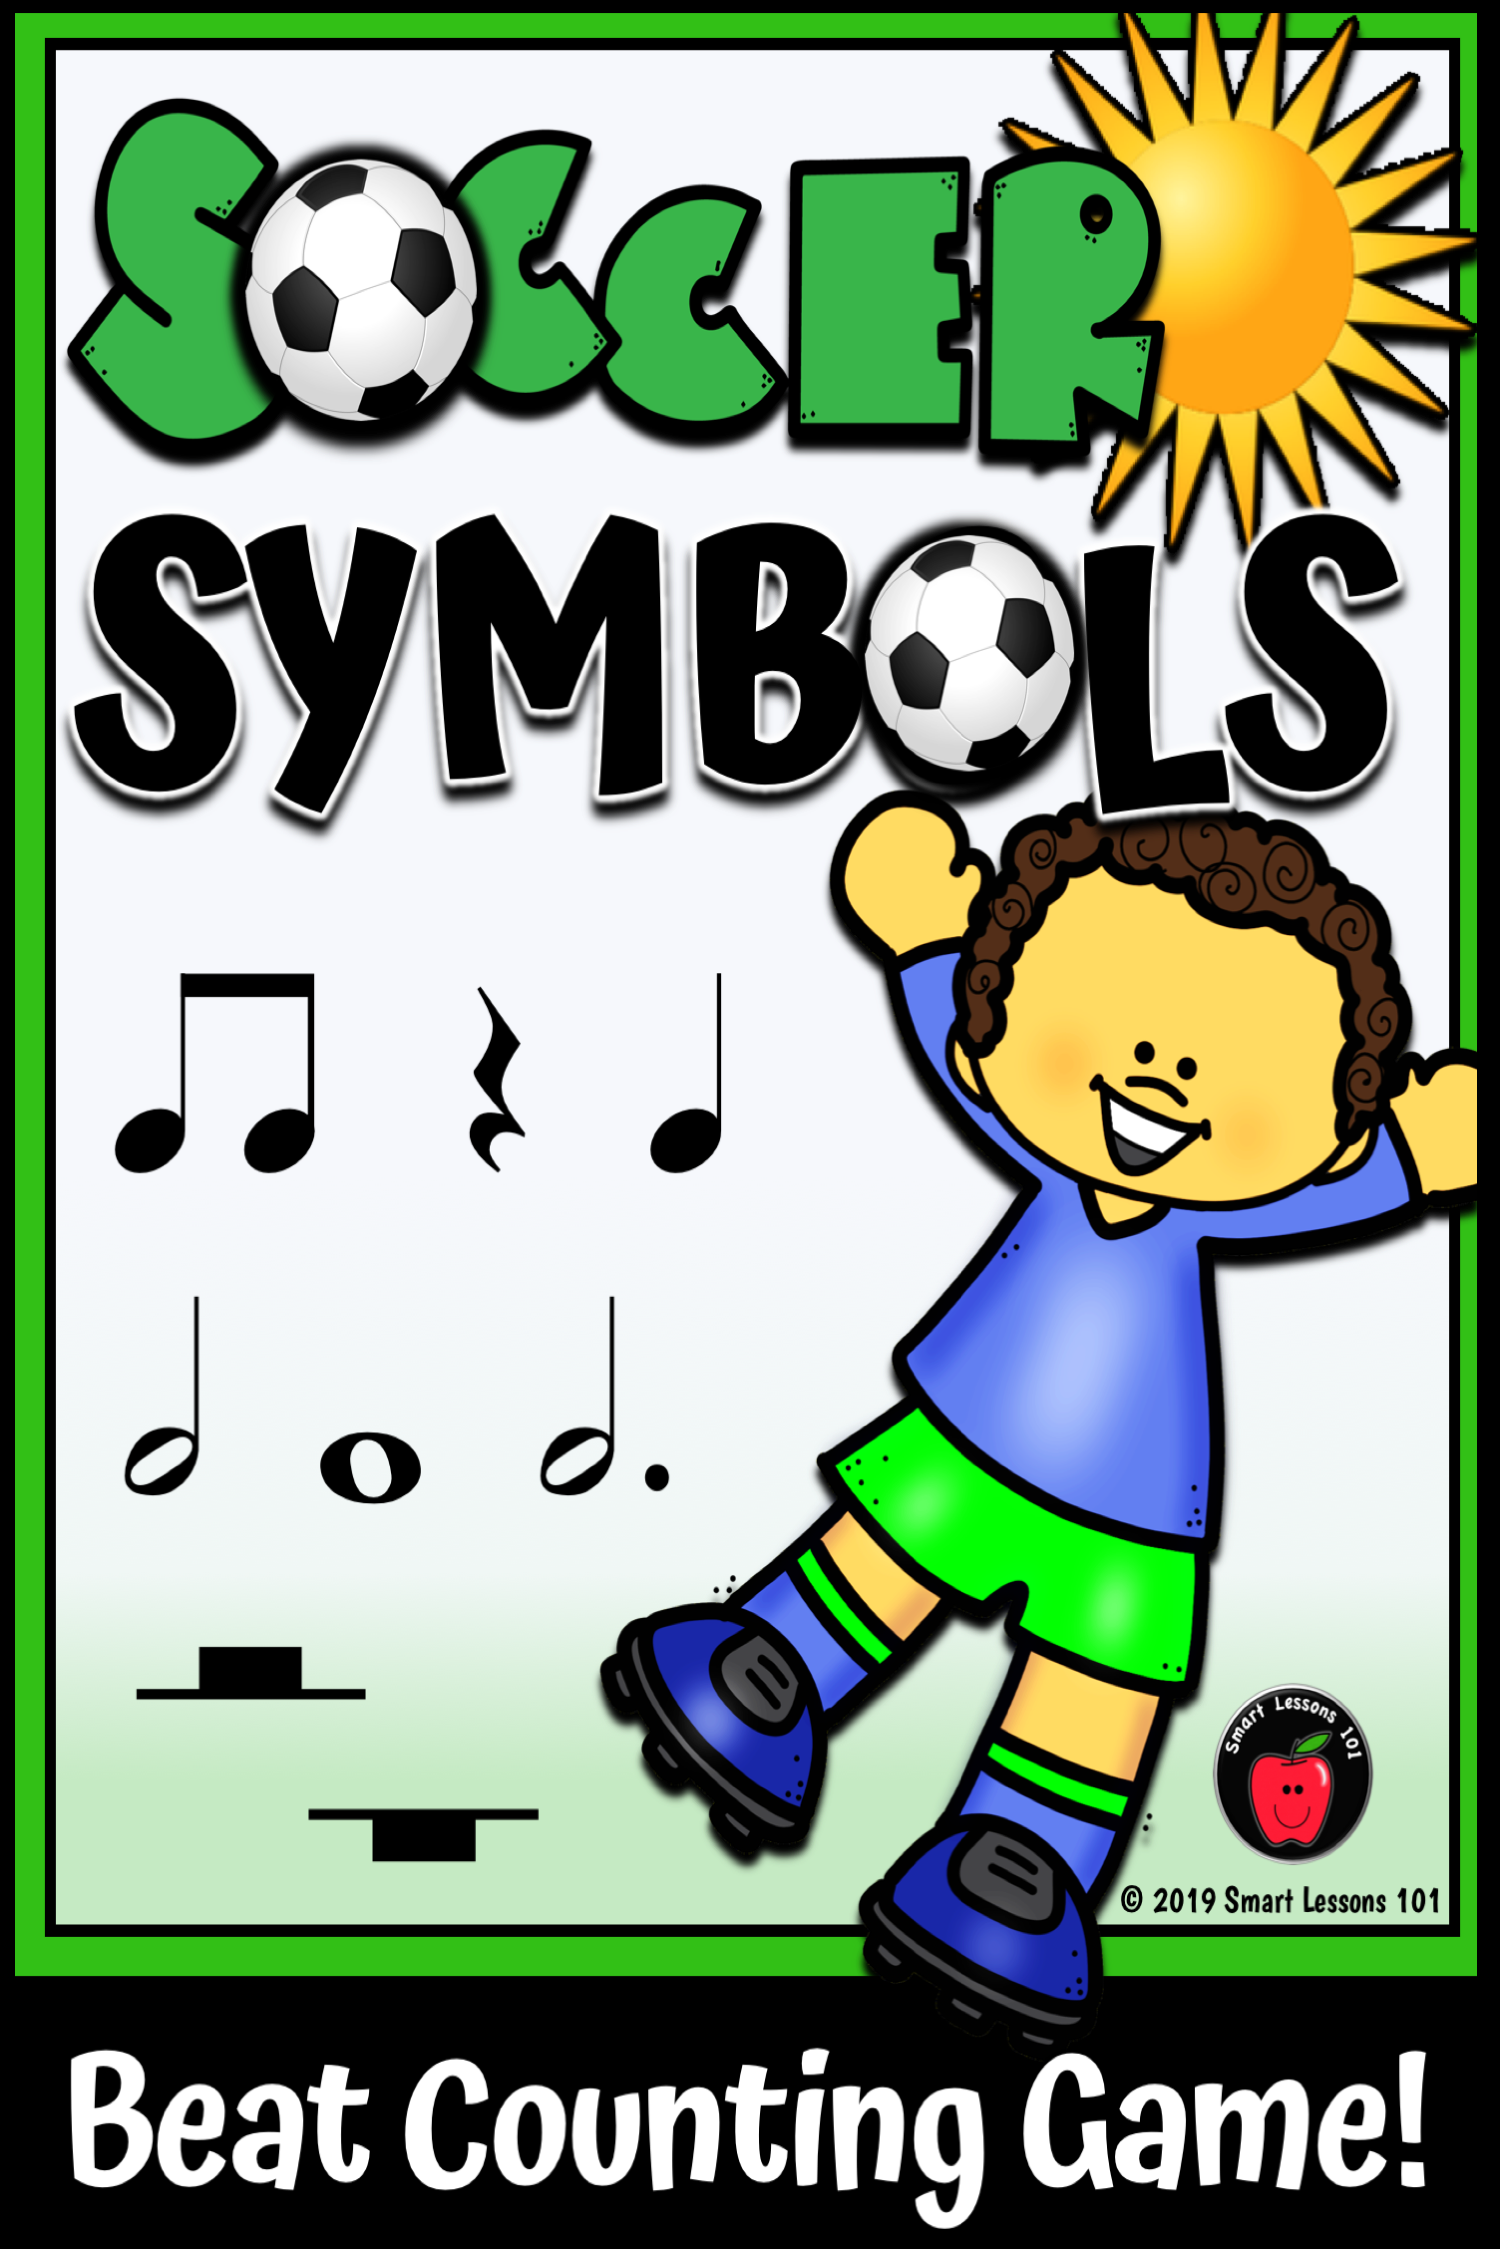 Soccer Symbols Note Value Music Game Rhythm Symbol Music